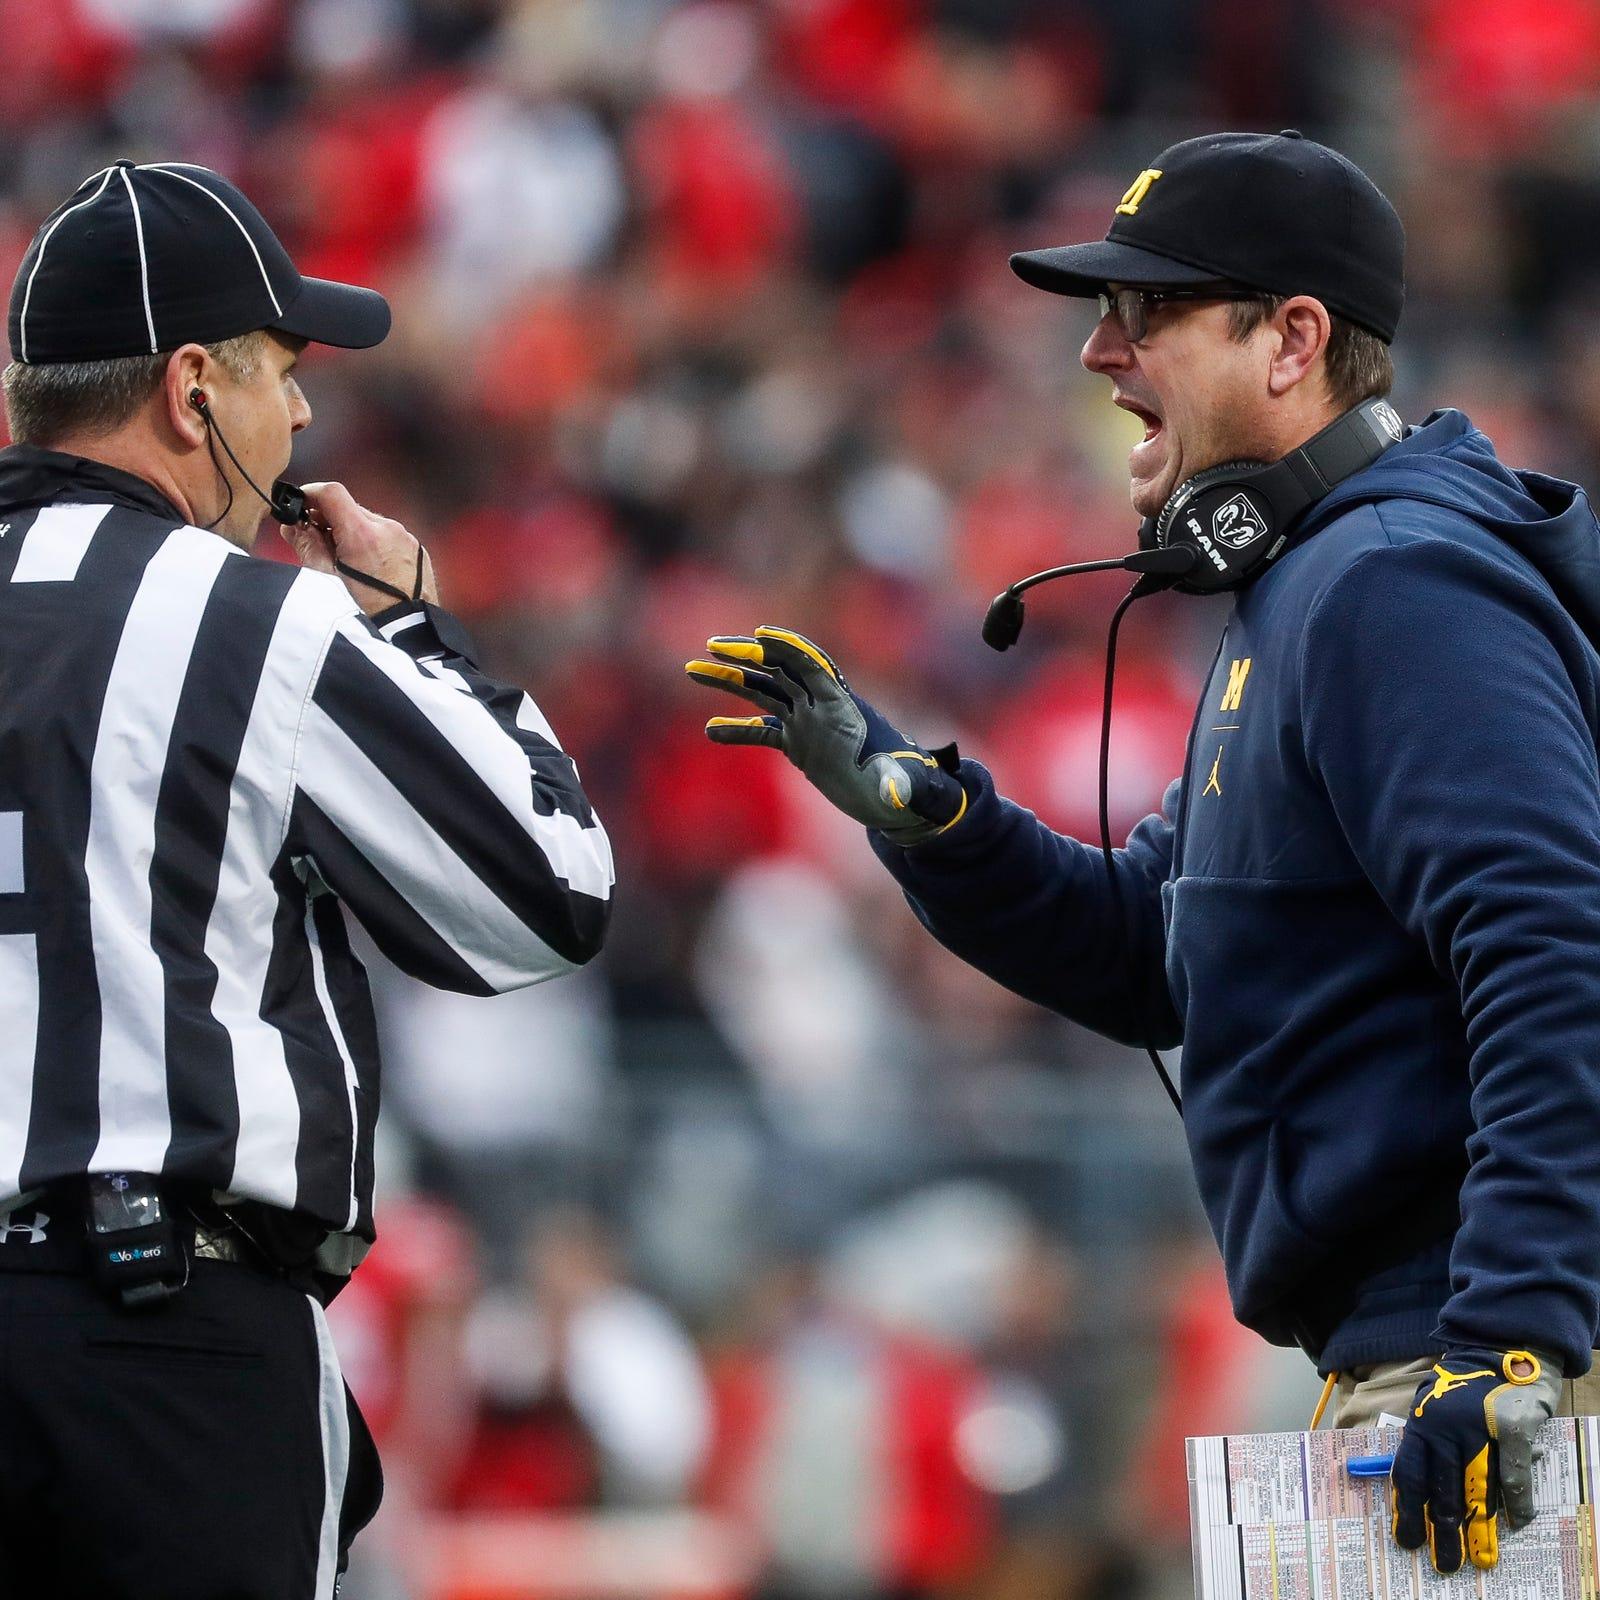 Jim Harbaugh to ESPN: 'I'm staying at Michigan'